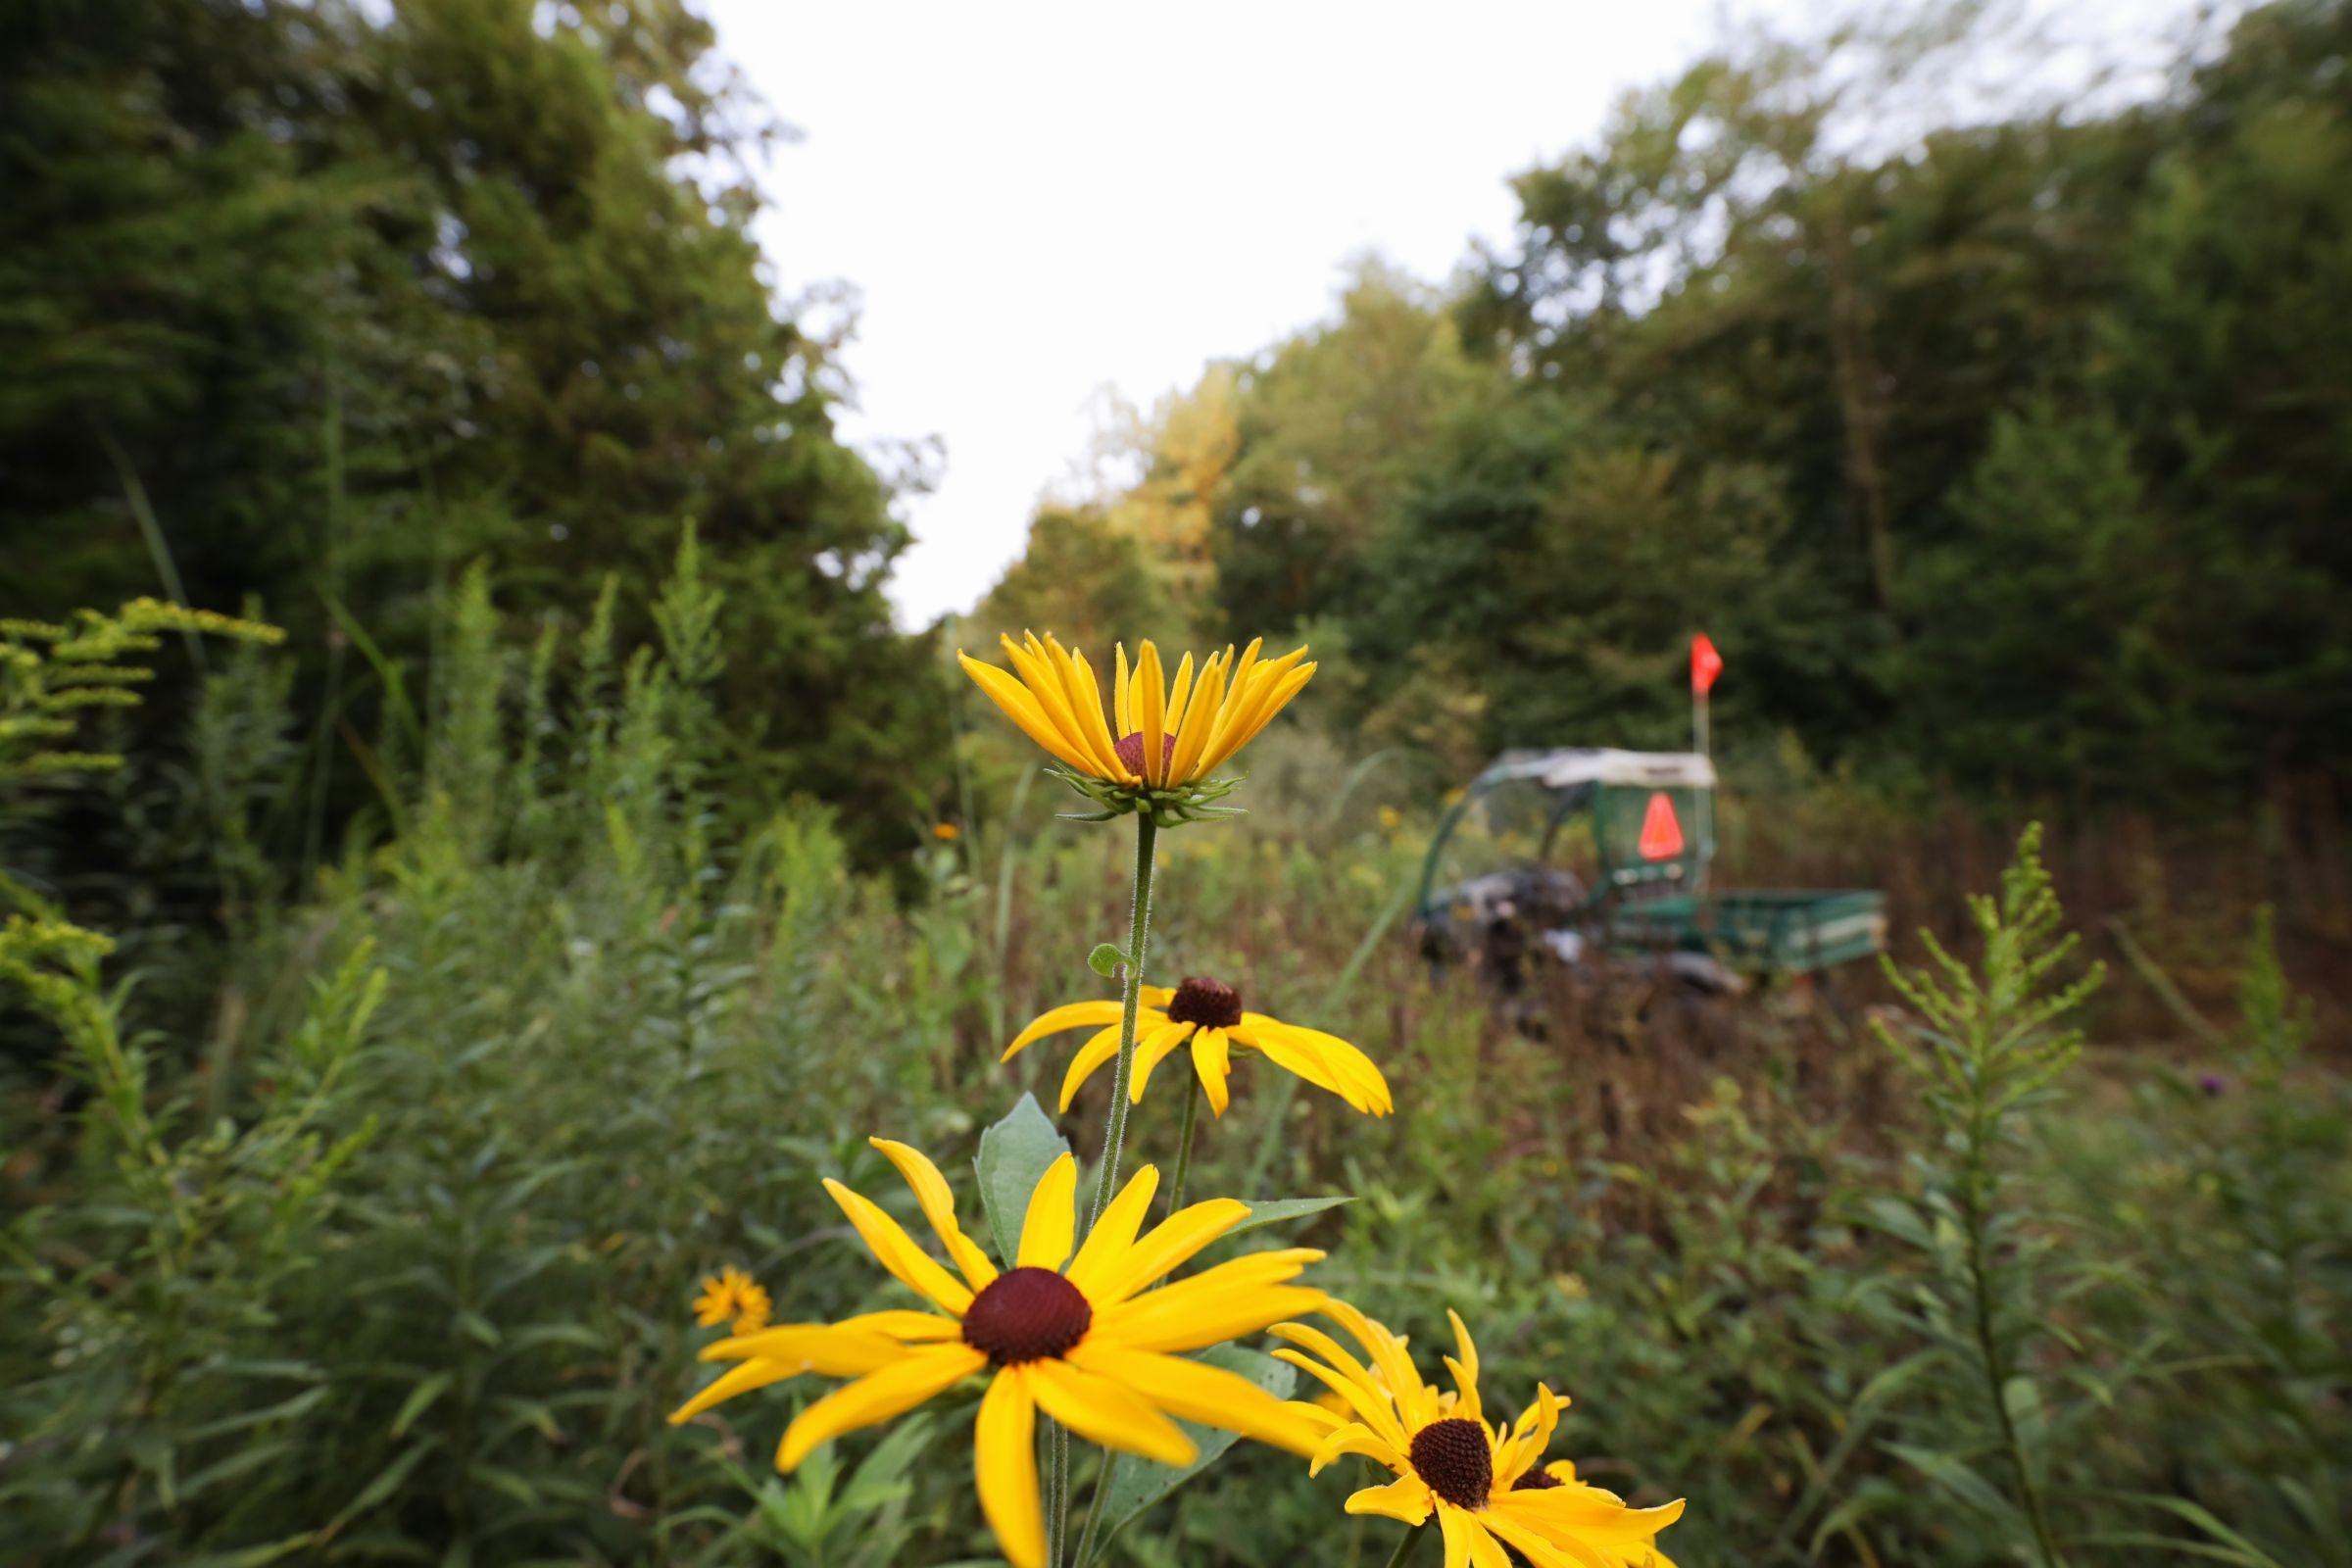 land-lee-county-iowa-328-acres-listing-number-15137-0-2020-08-27-174847.jpg